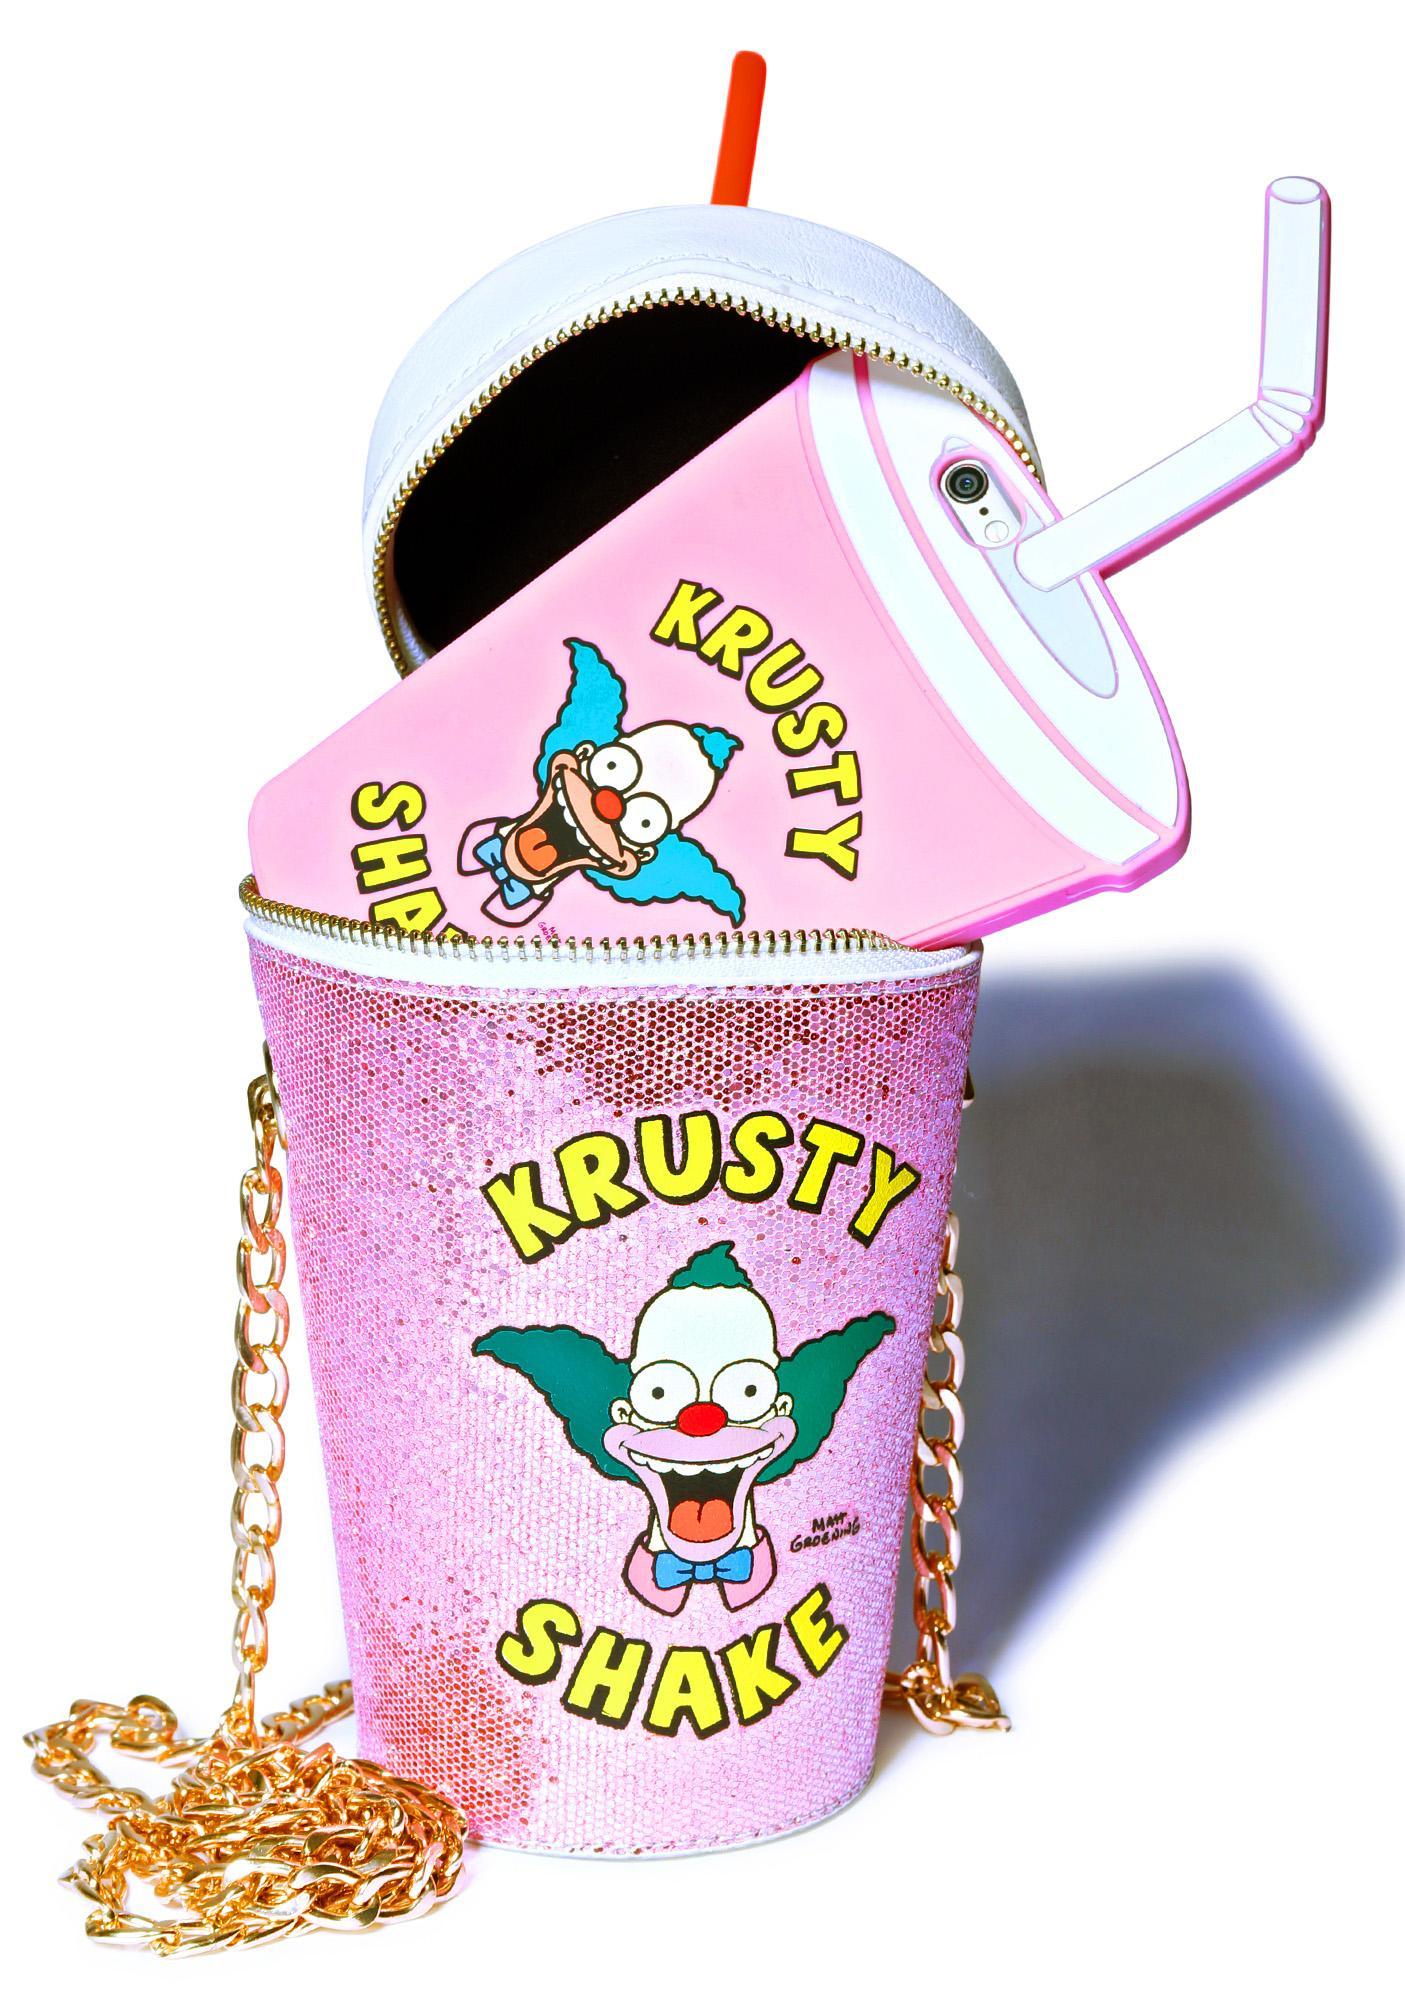 Skinnydip Krusty Shake Crossbody Bag